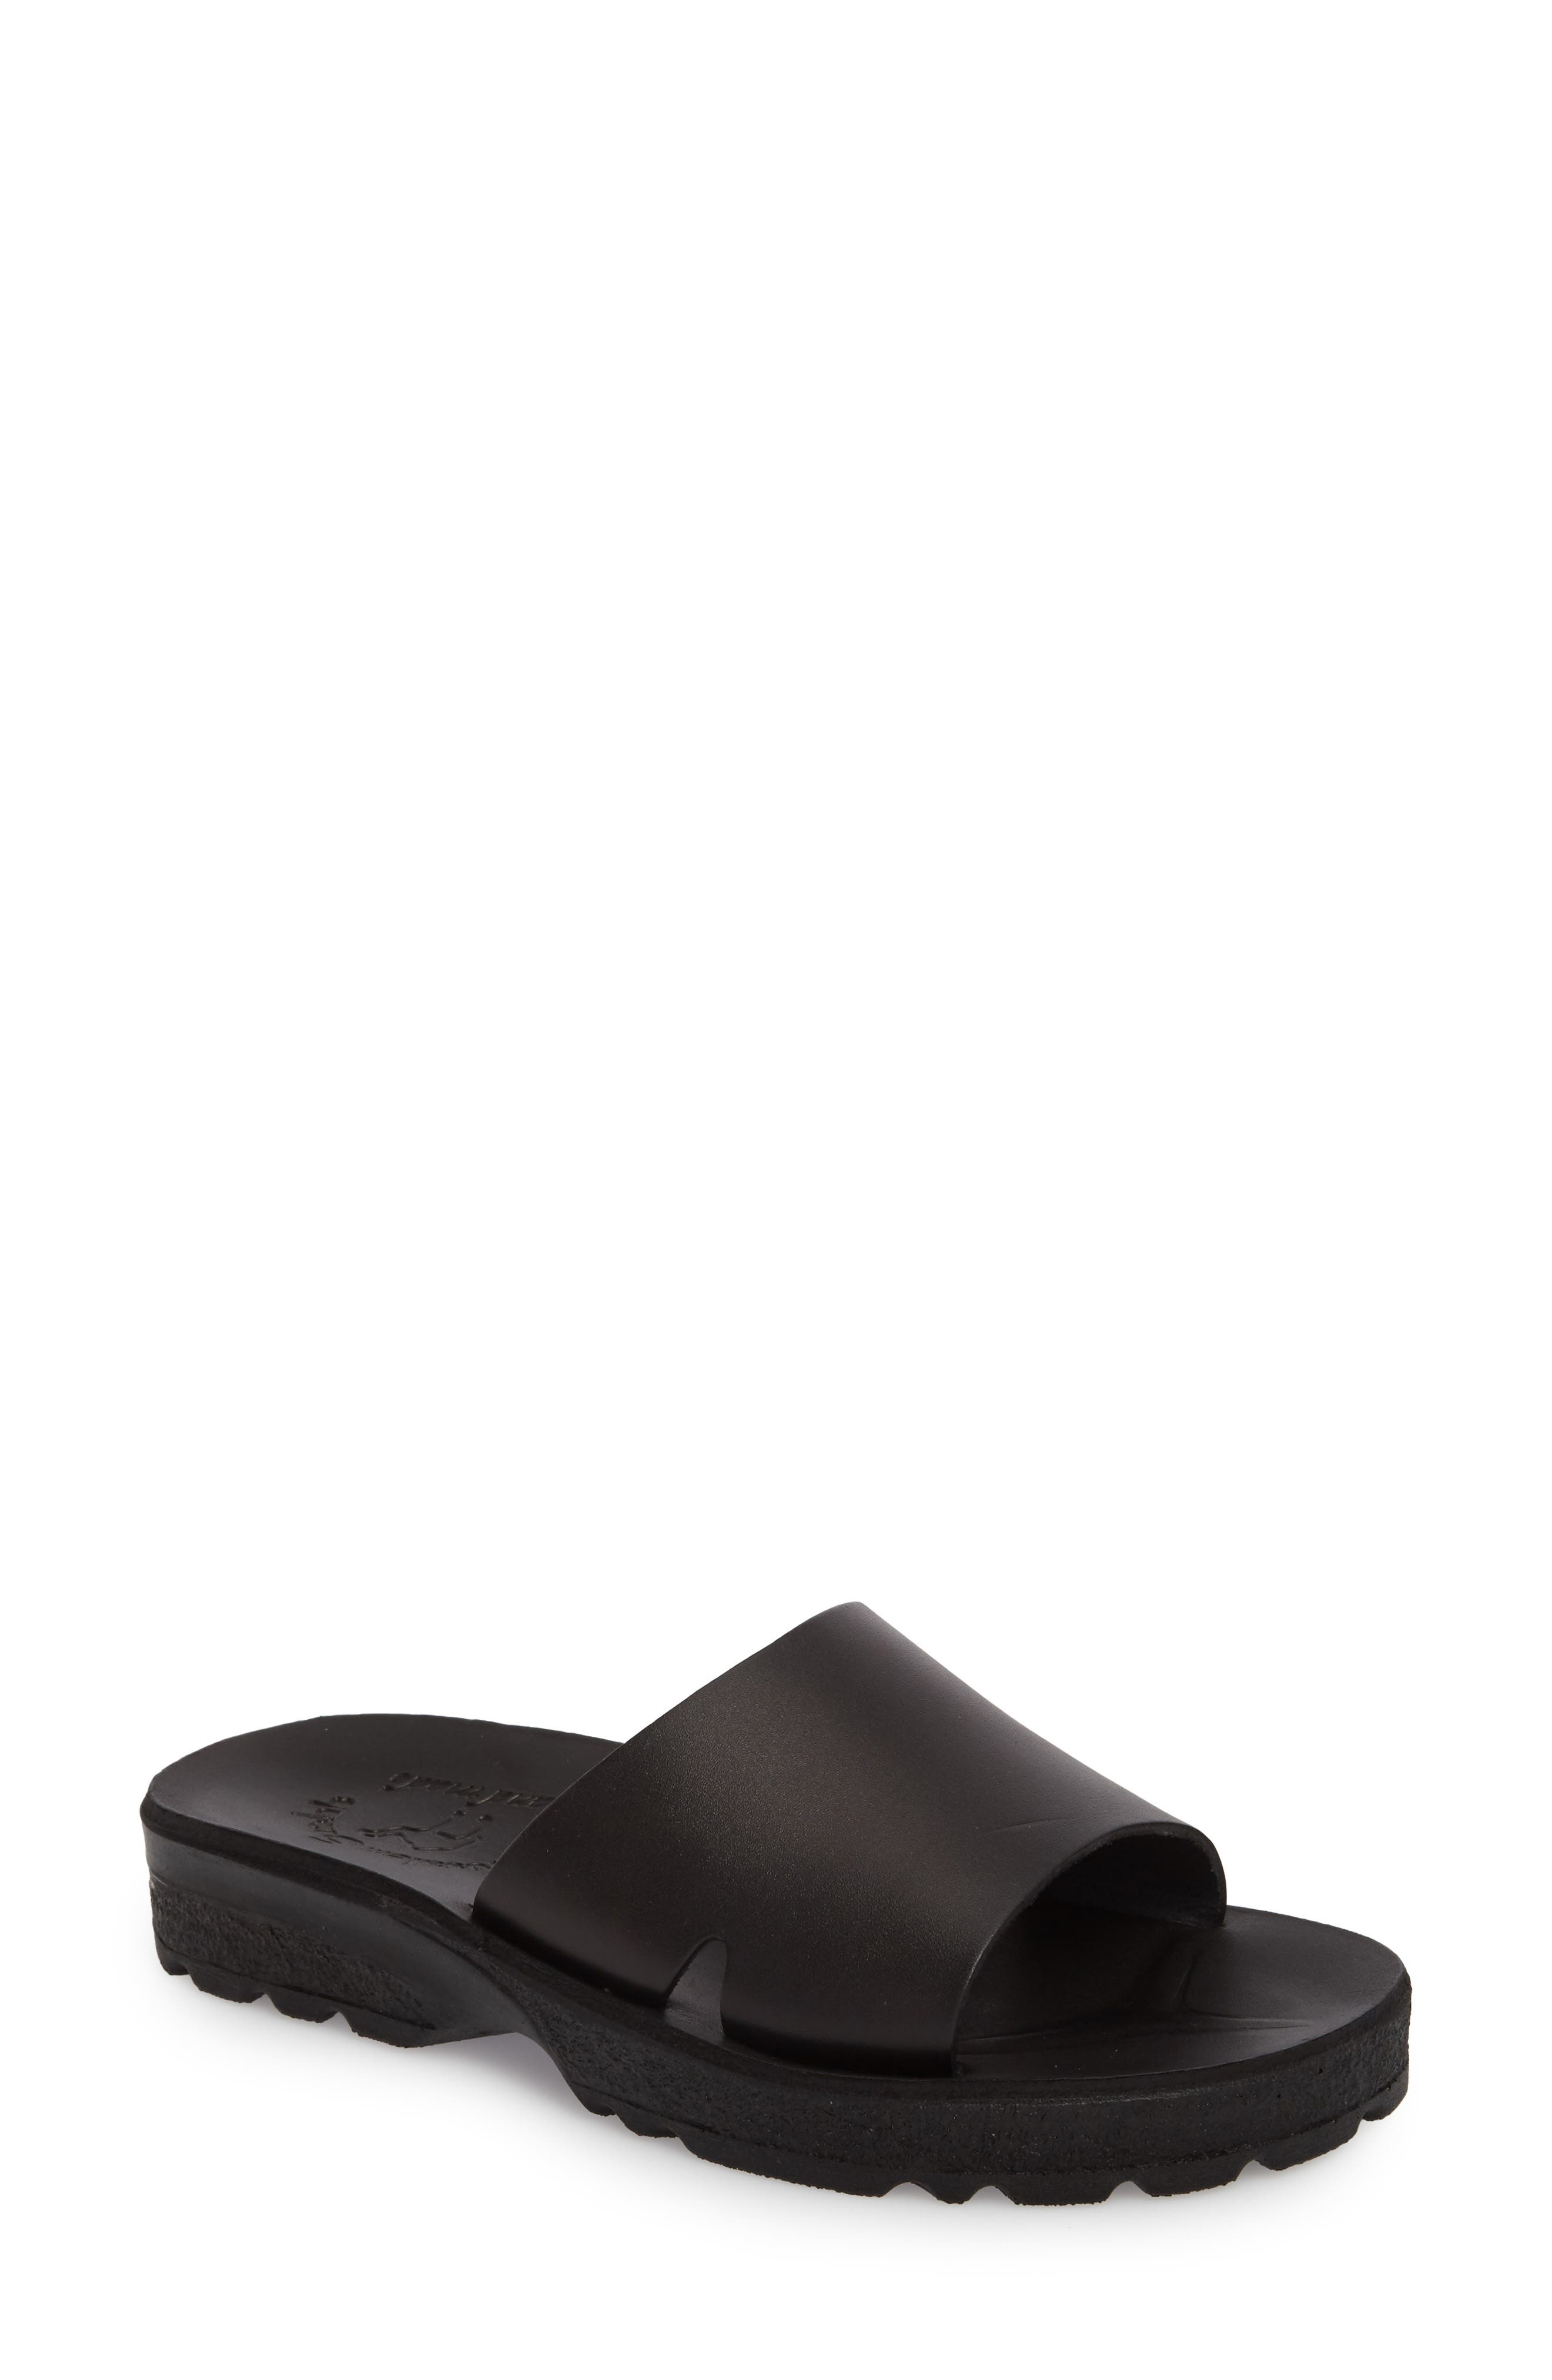 Bashn Molded Footbed Slide Sandal,                             Main thumbnail 1, color,                             Black Leather